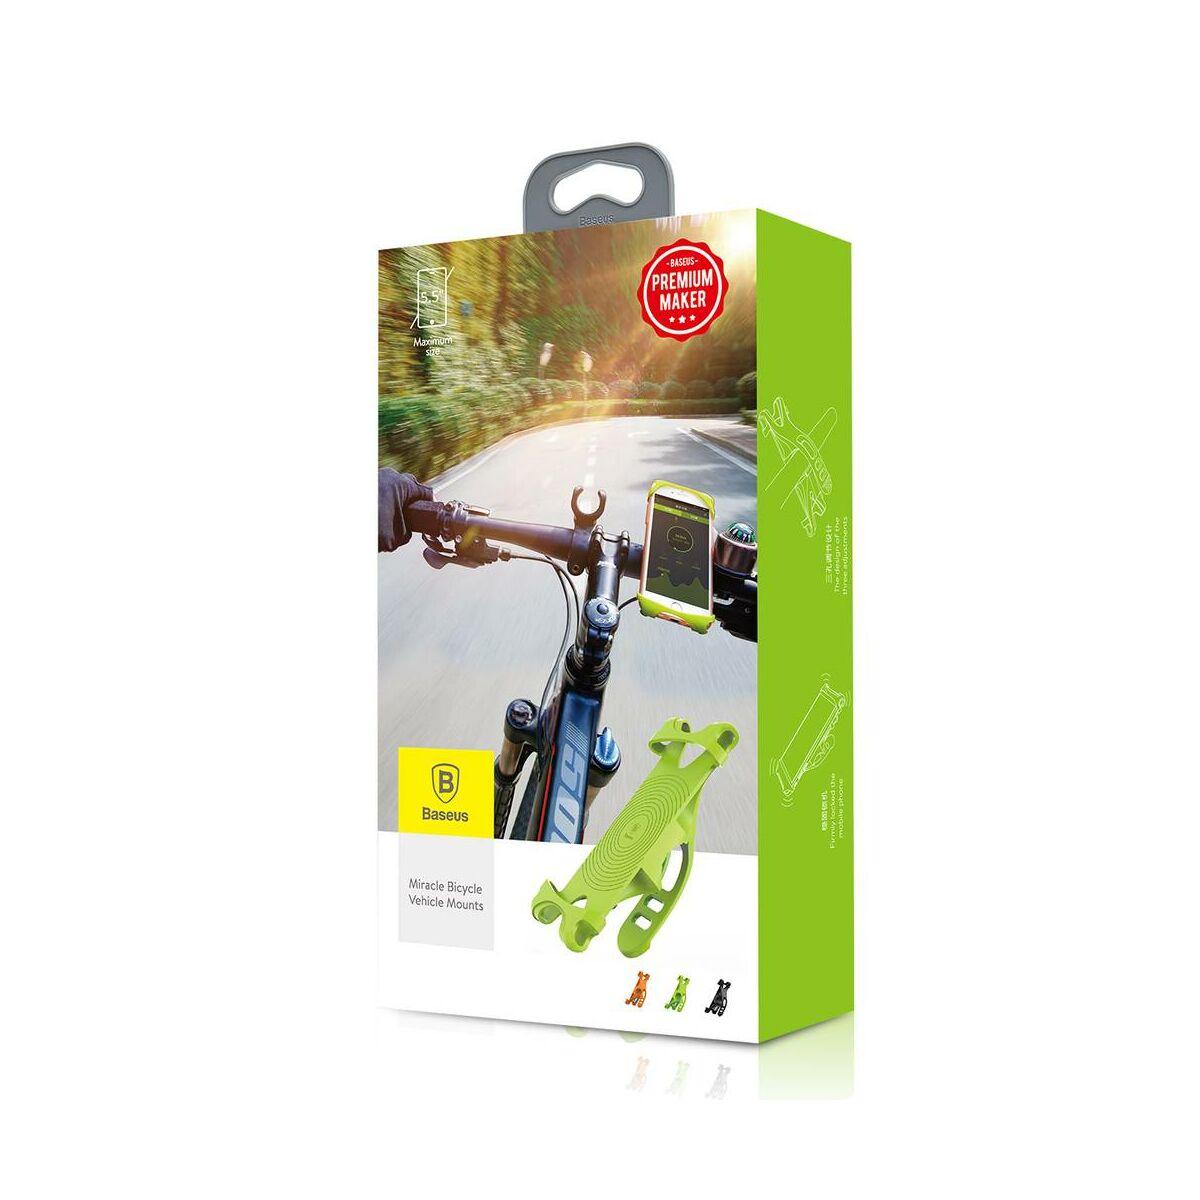 Baseus Miracle mobiltelefontartó, biciklire, zöld (SUMIR-BY06)